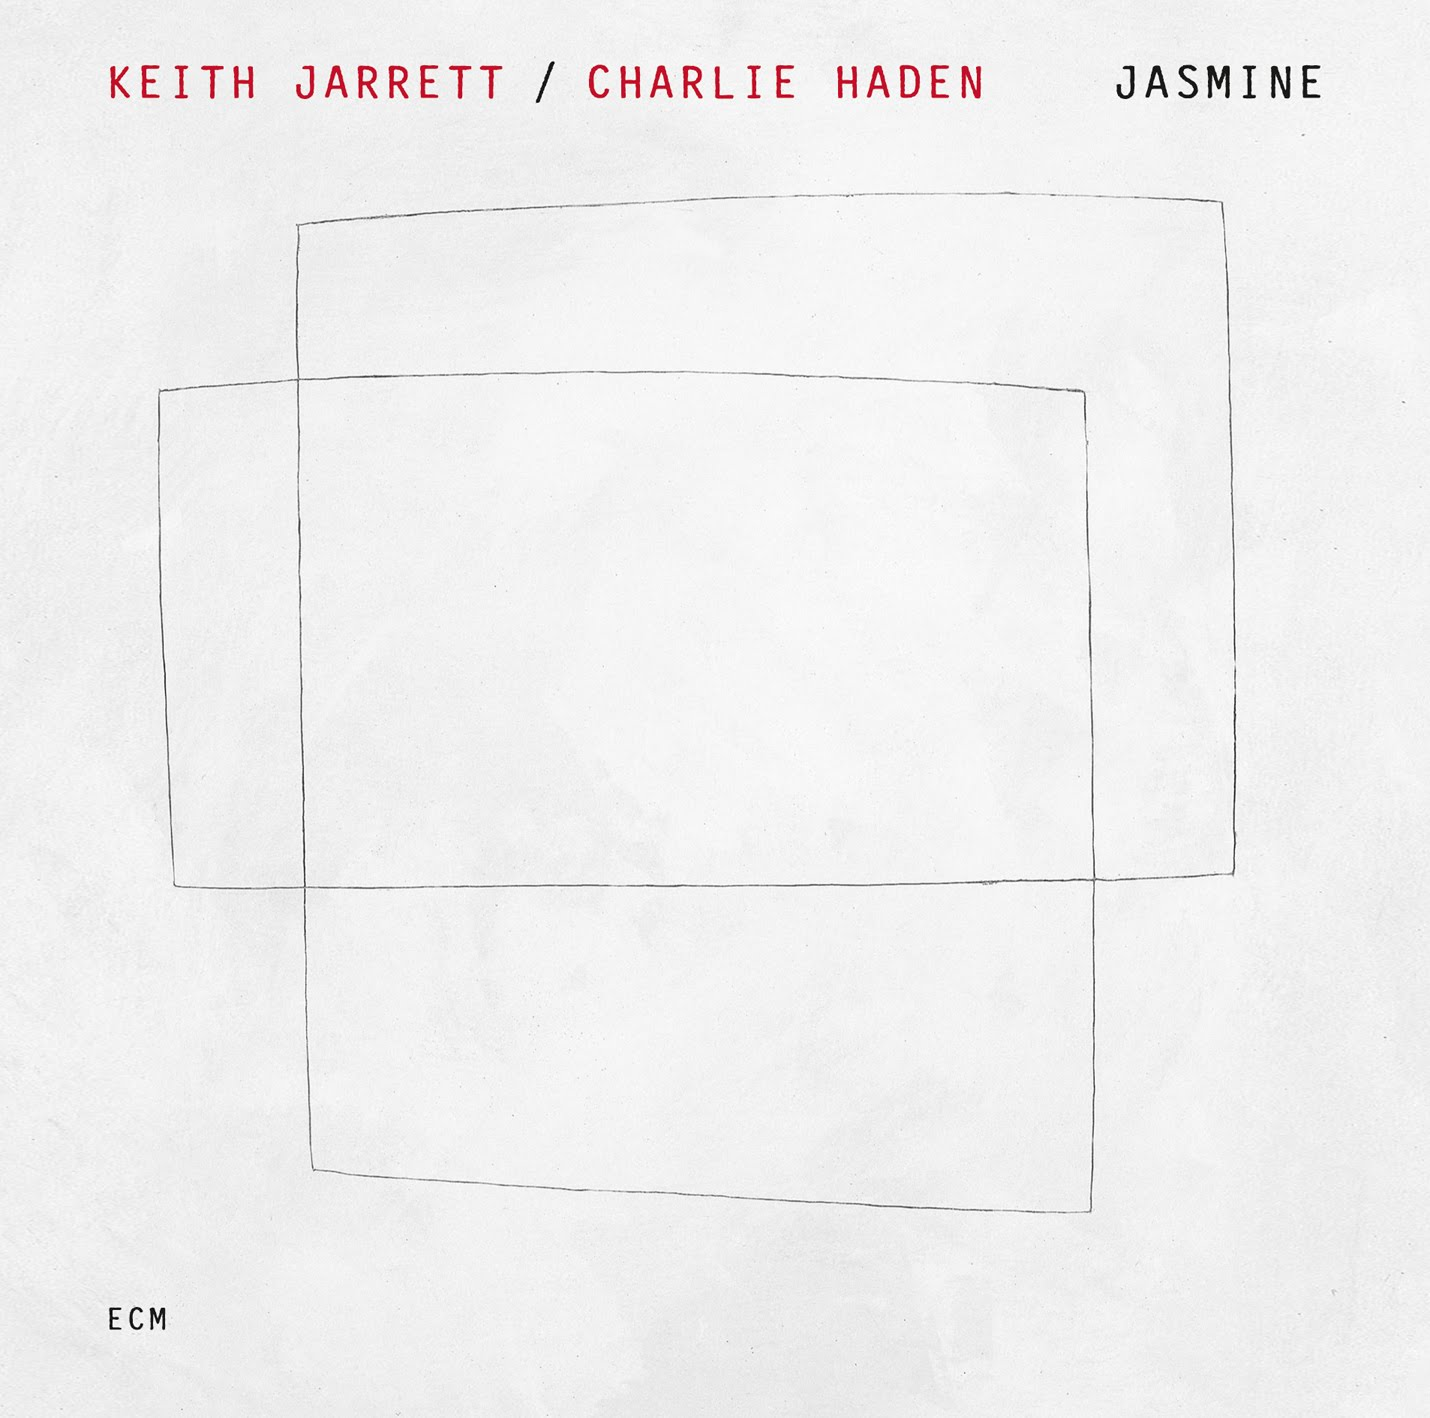 Keith Jarrett - Charlie Haden - Jasmine - 2010